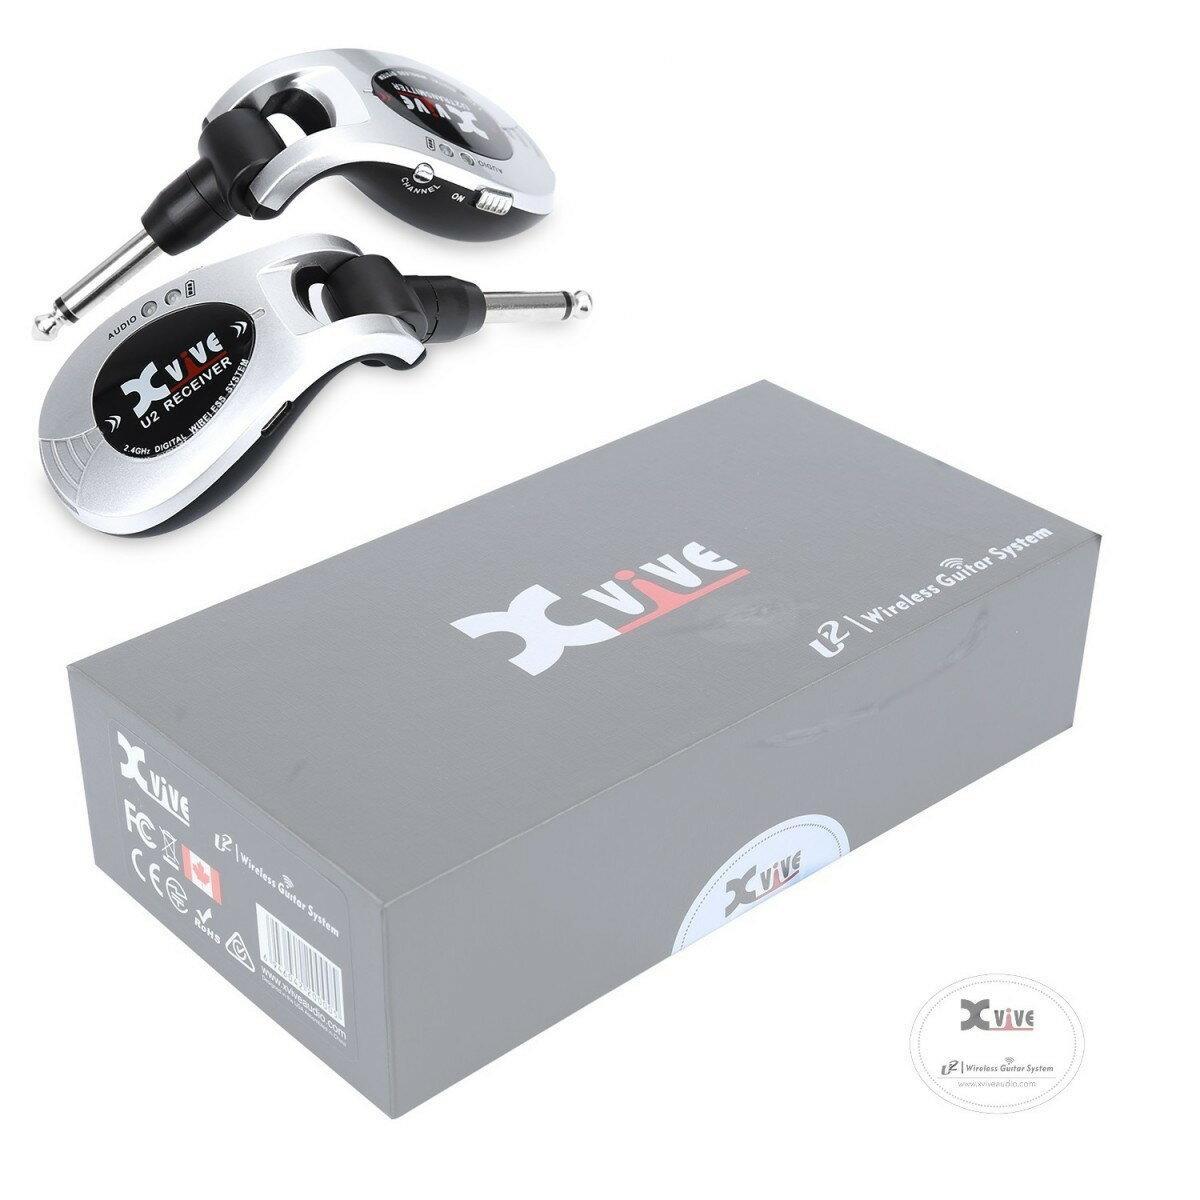 Xvive XV-U2 SV デジタル ワイヤレスシステム シルバー XV U2